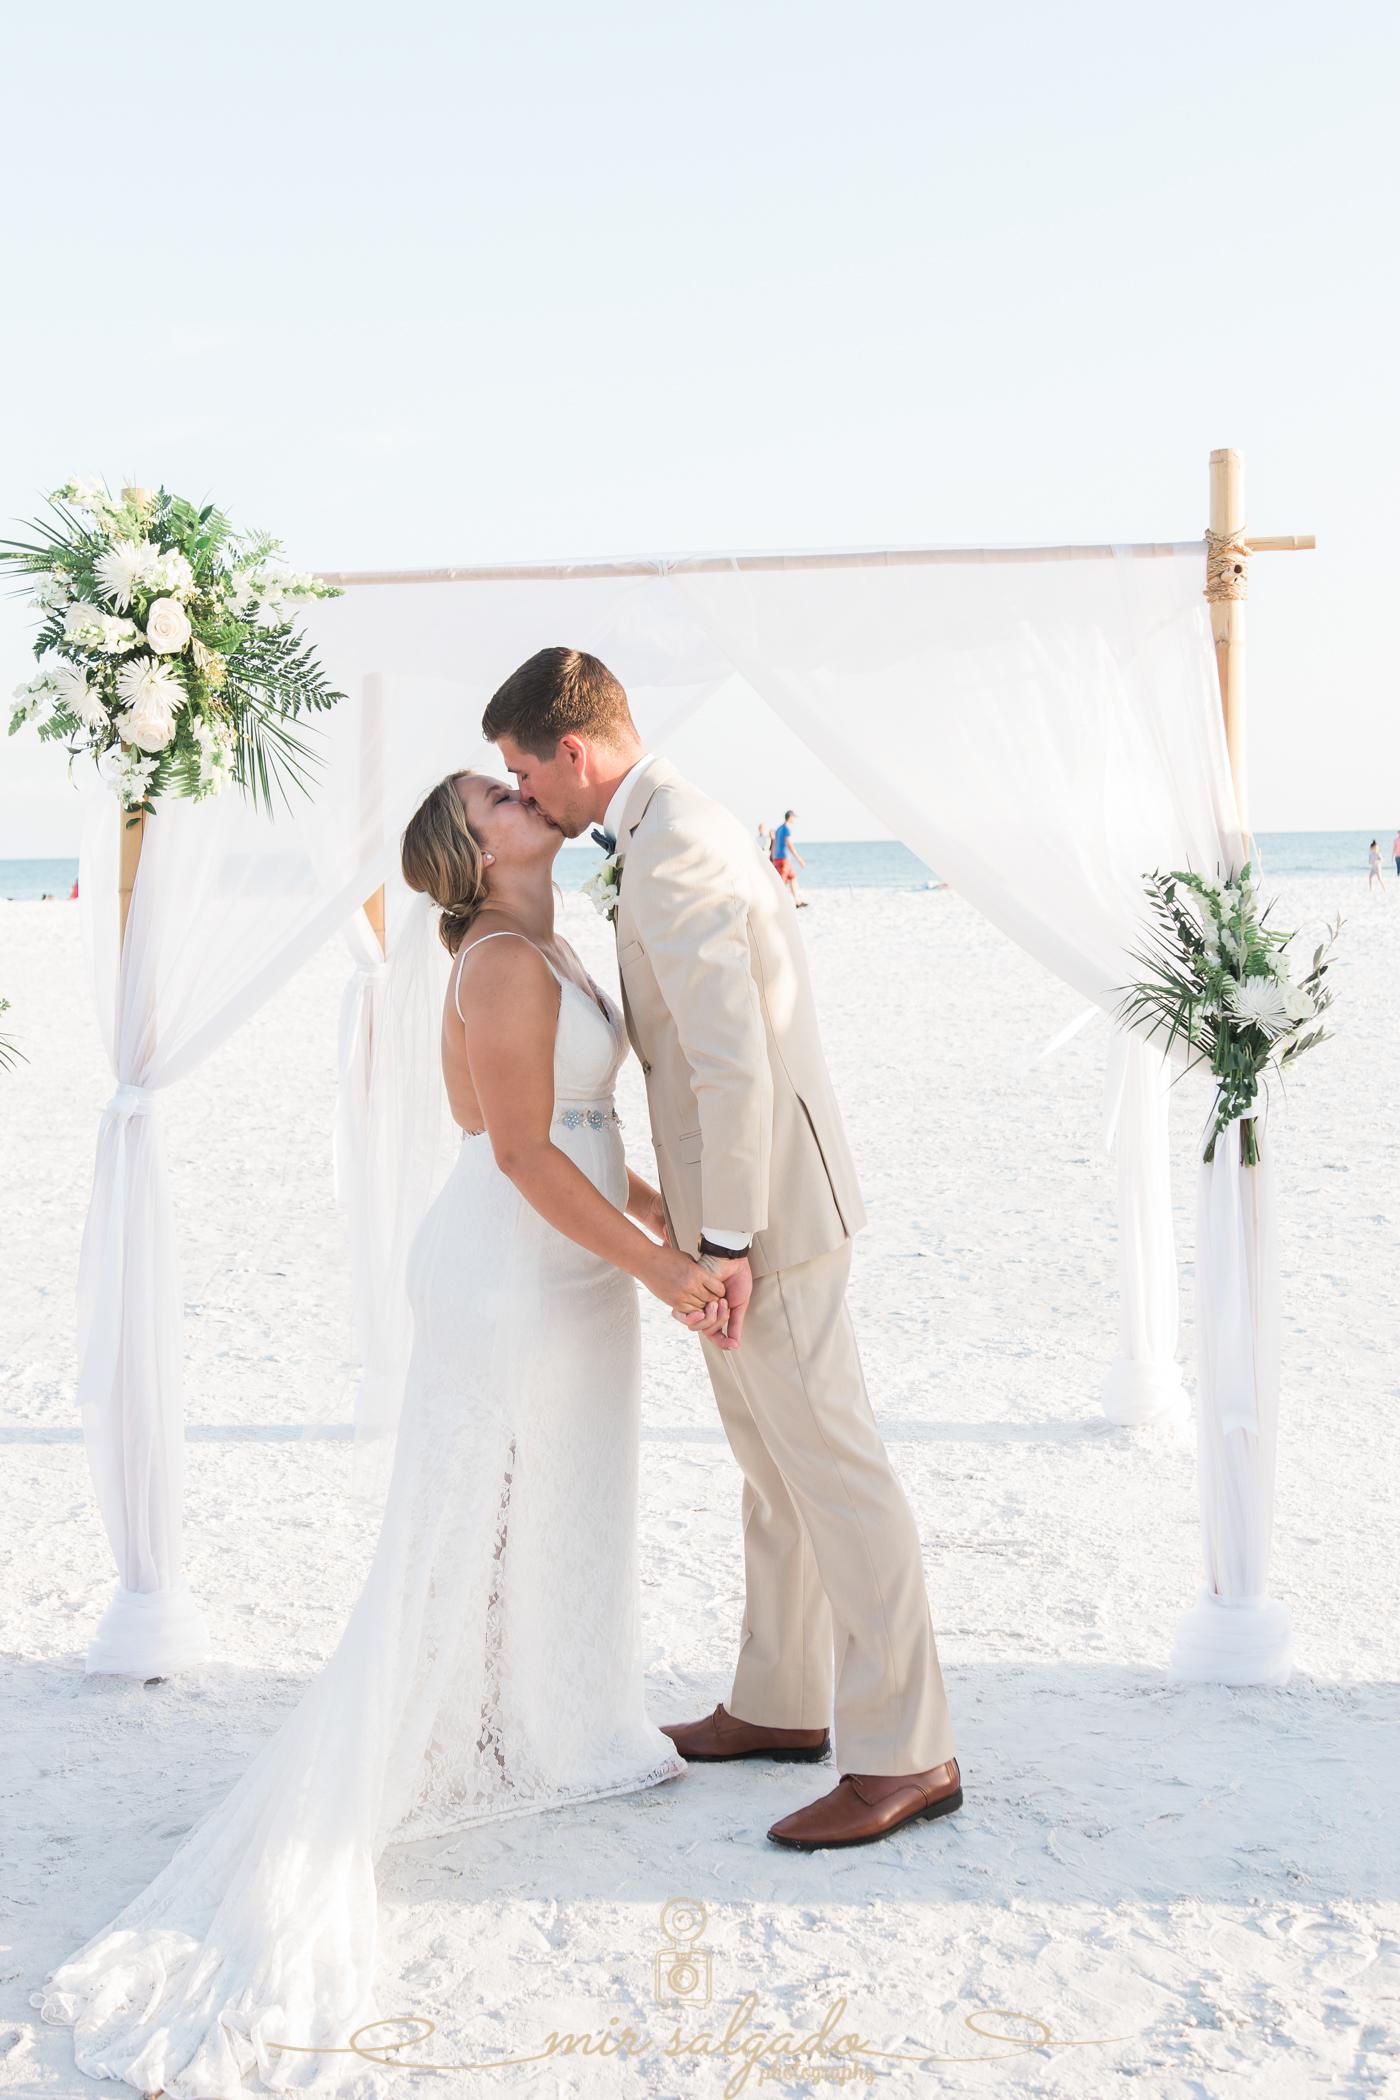 Wedding-photography, first-kiss, beach-wedding